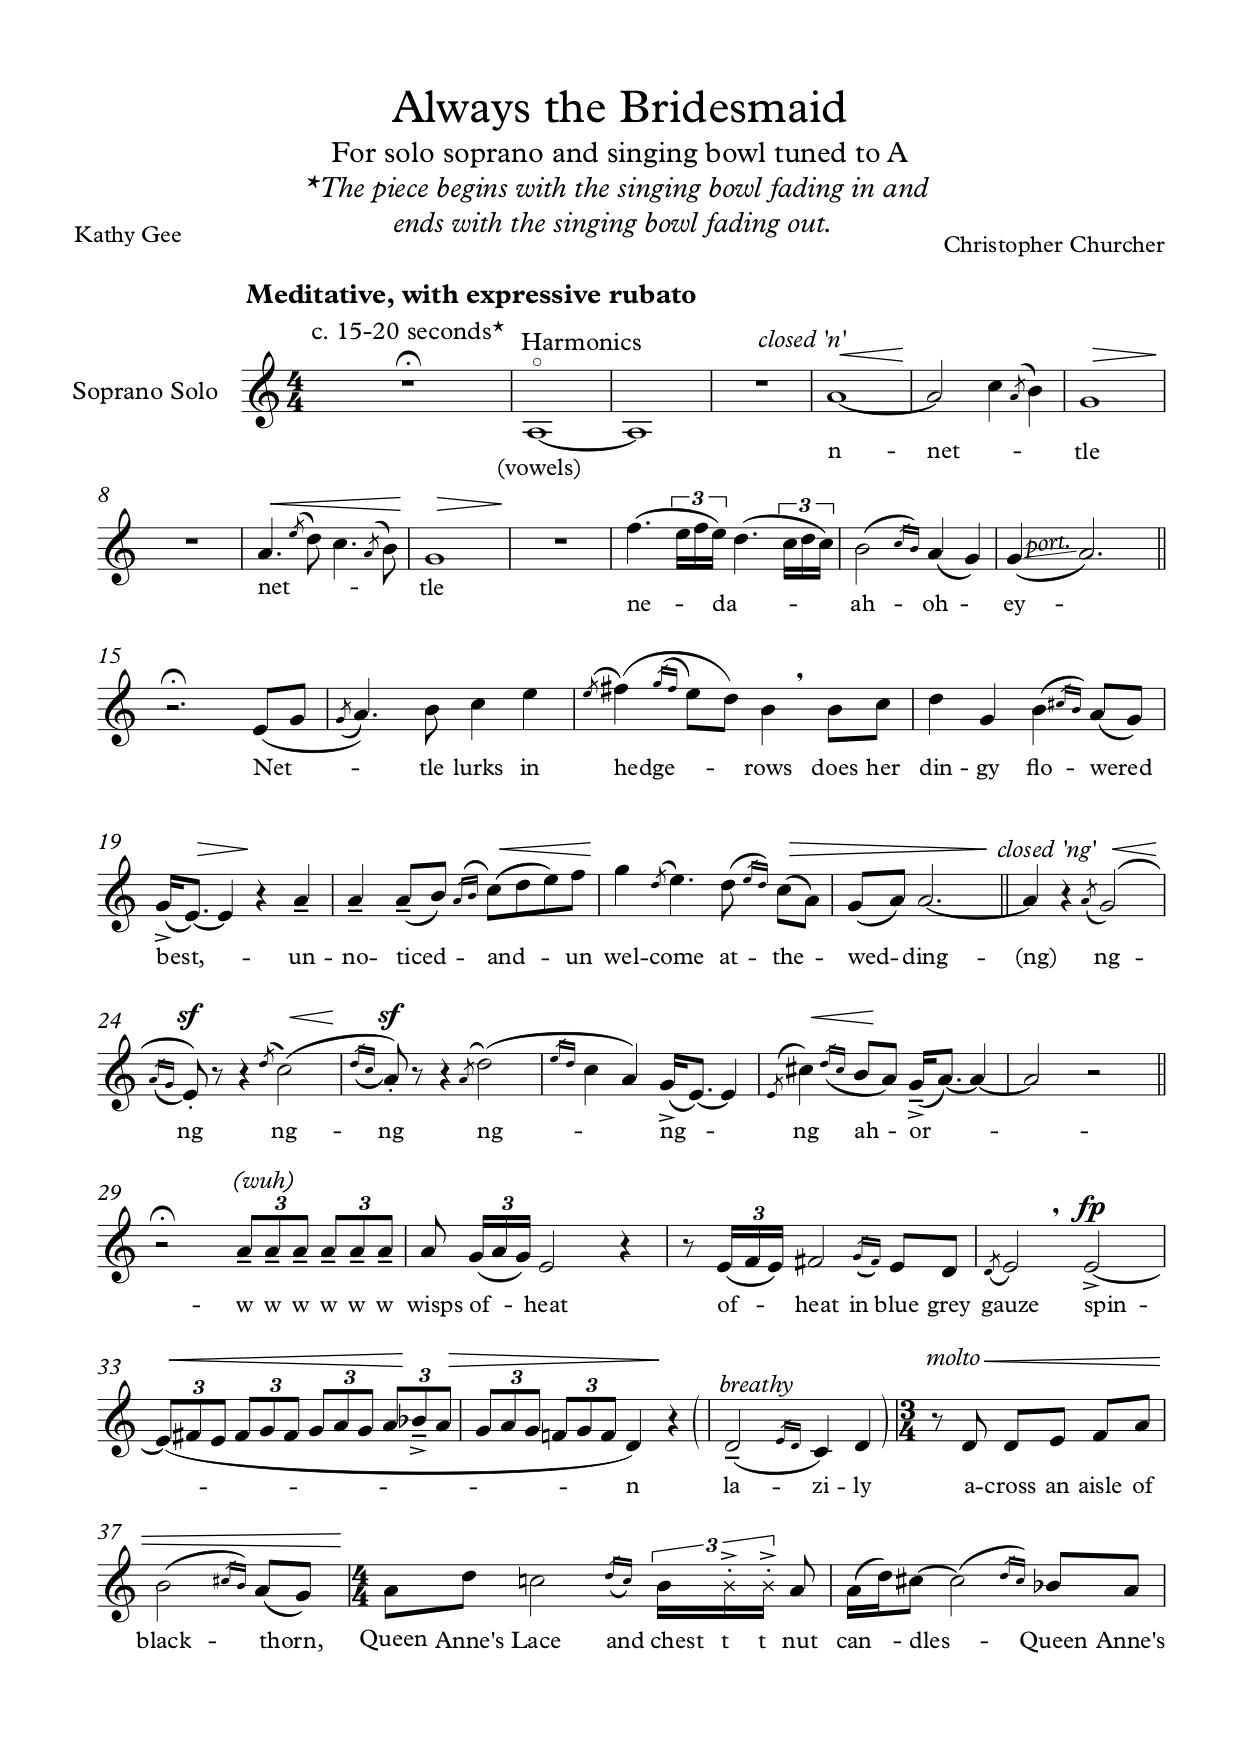 Christopher Churcher's 'Always the Bridesmaid' (Music Department at King Edward's School, Birmingham)